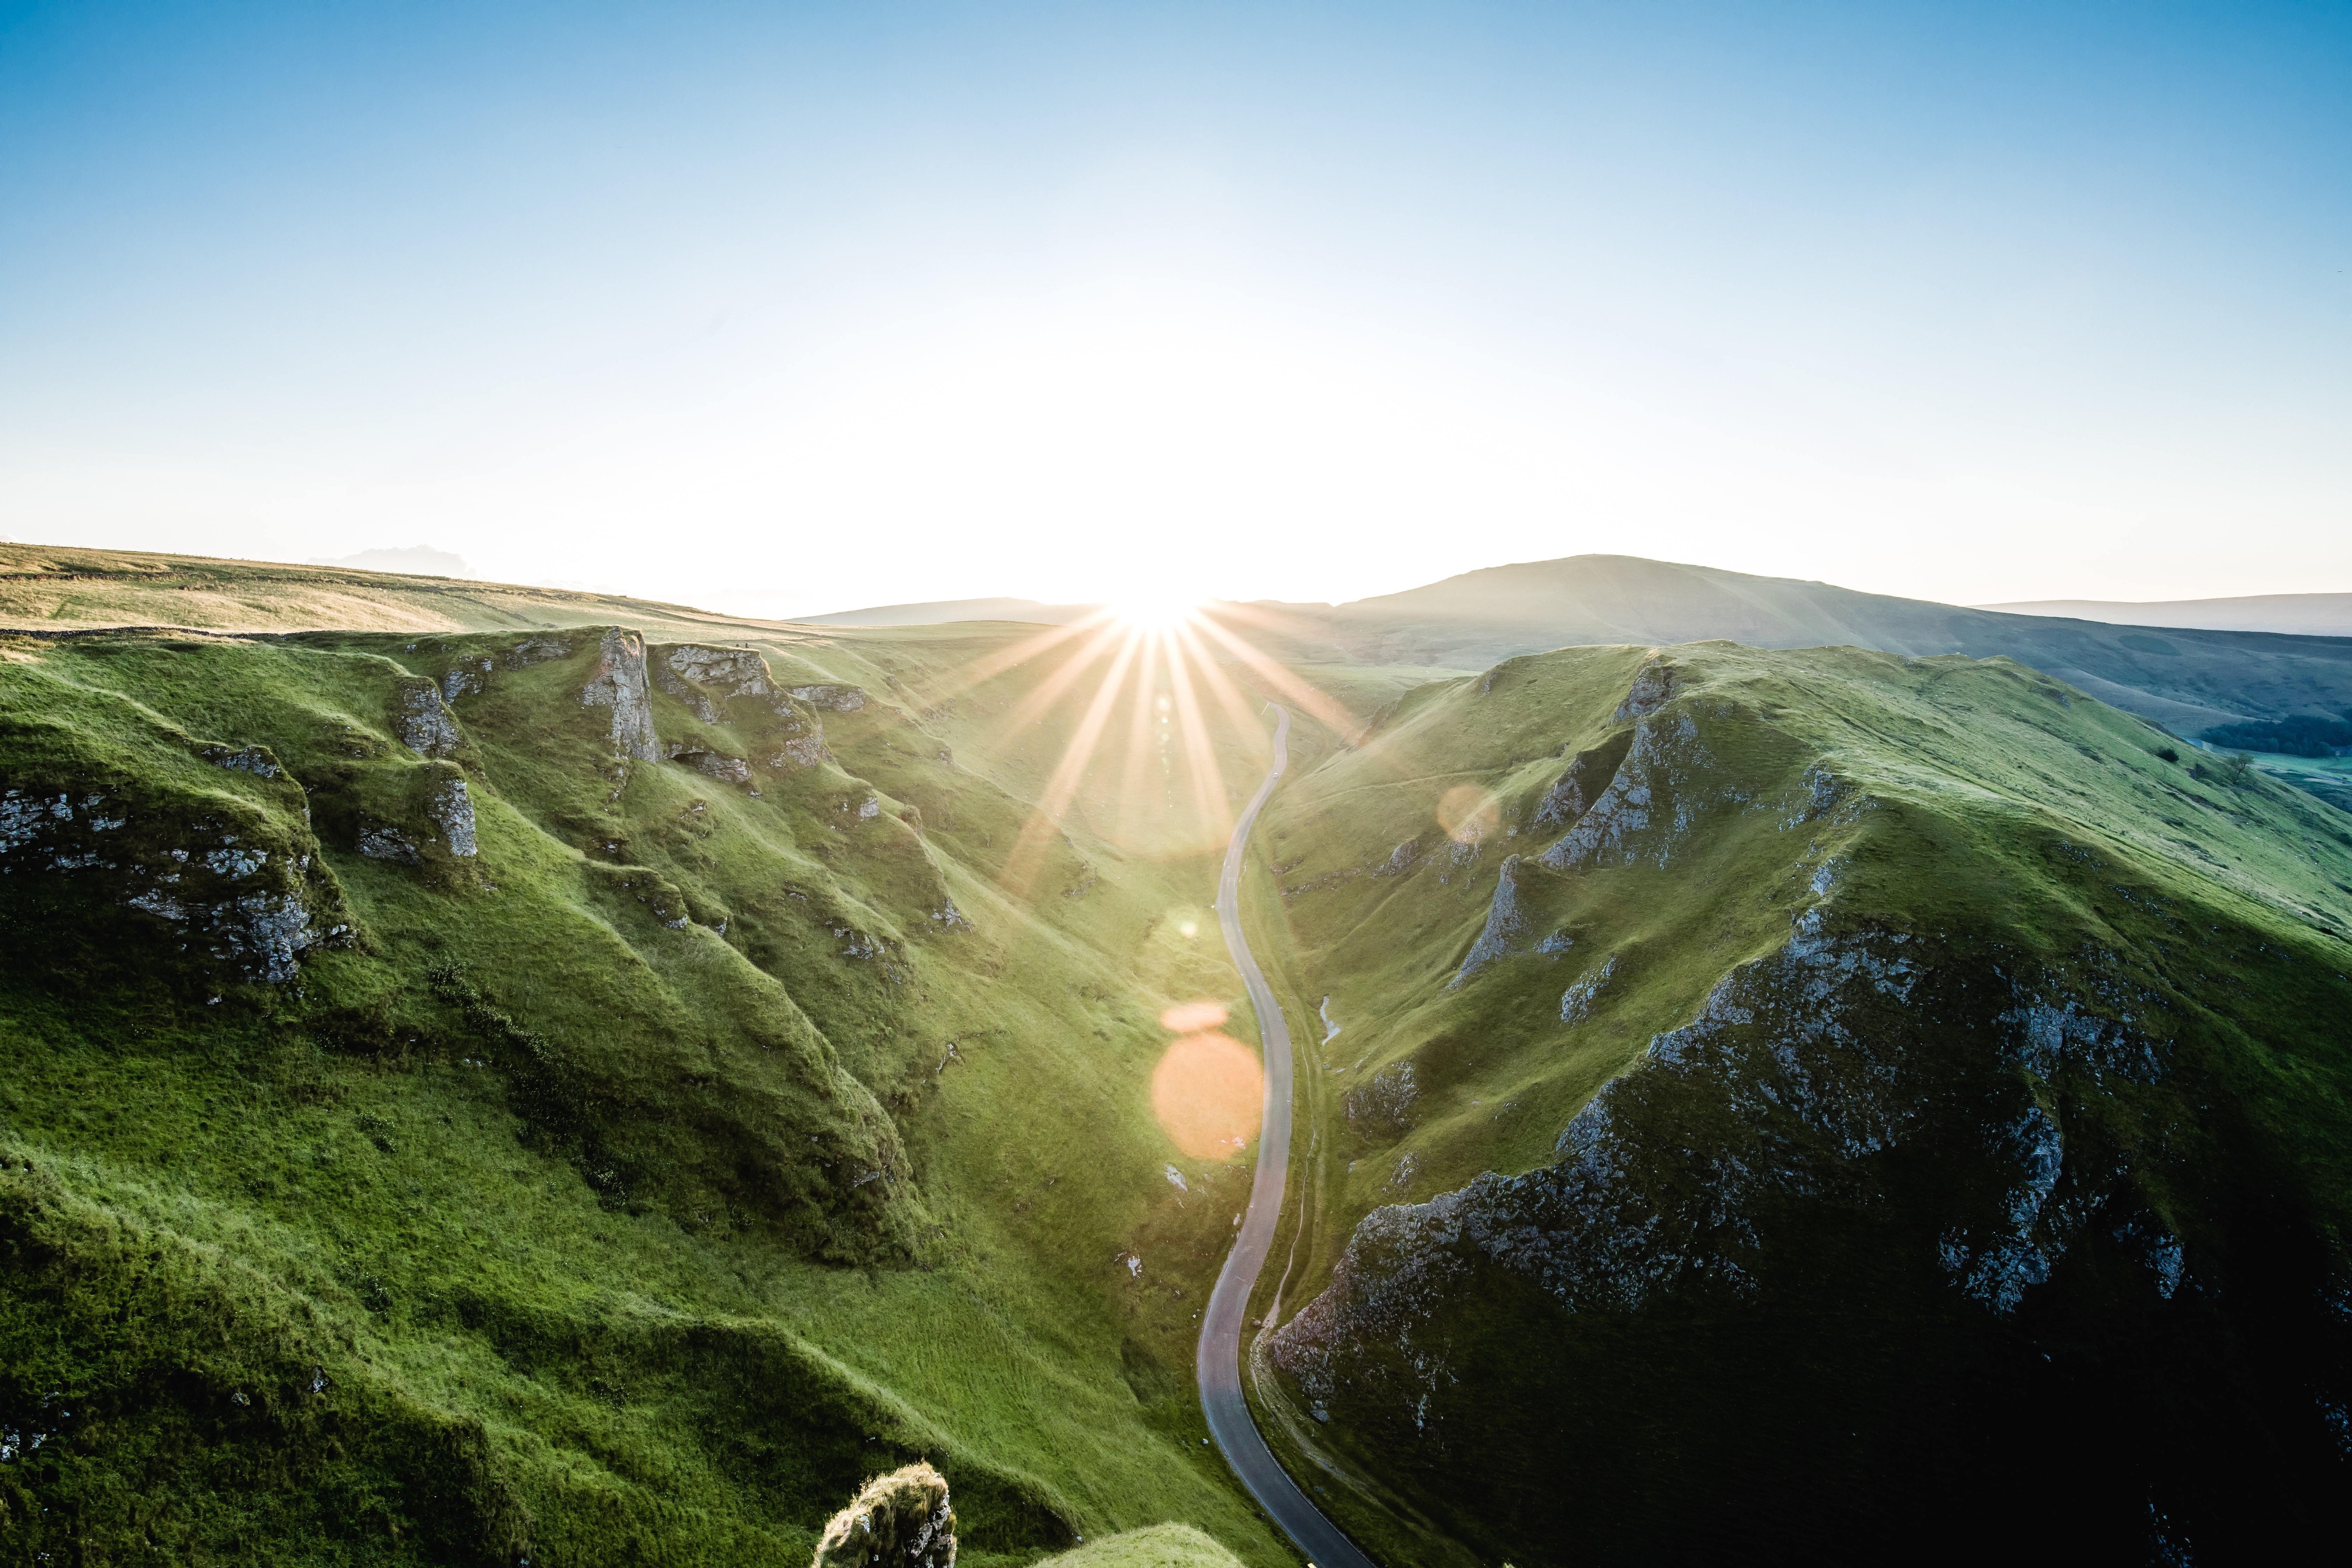 Winnats Pass, Hope Valley, UK.